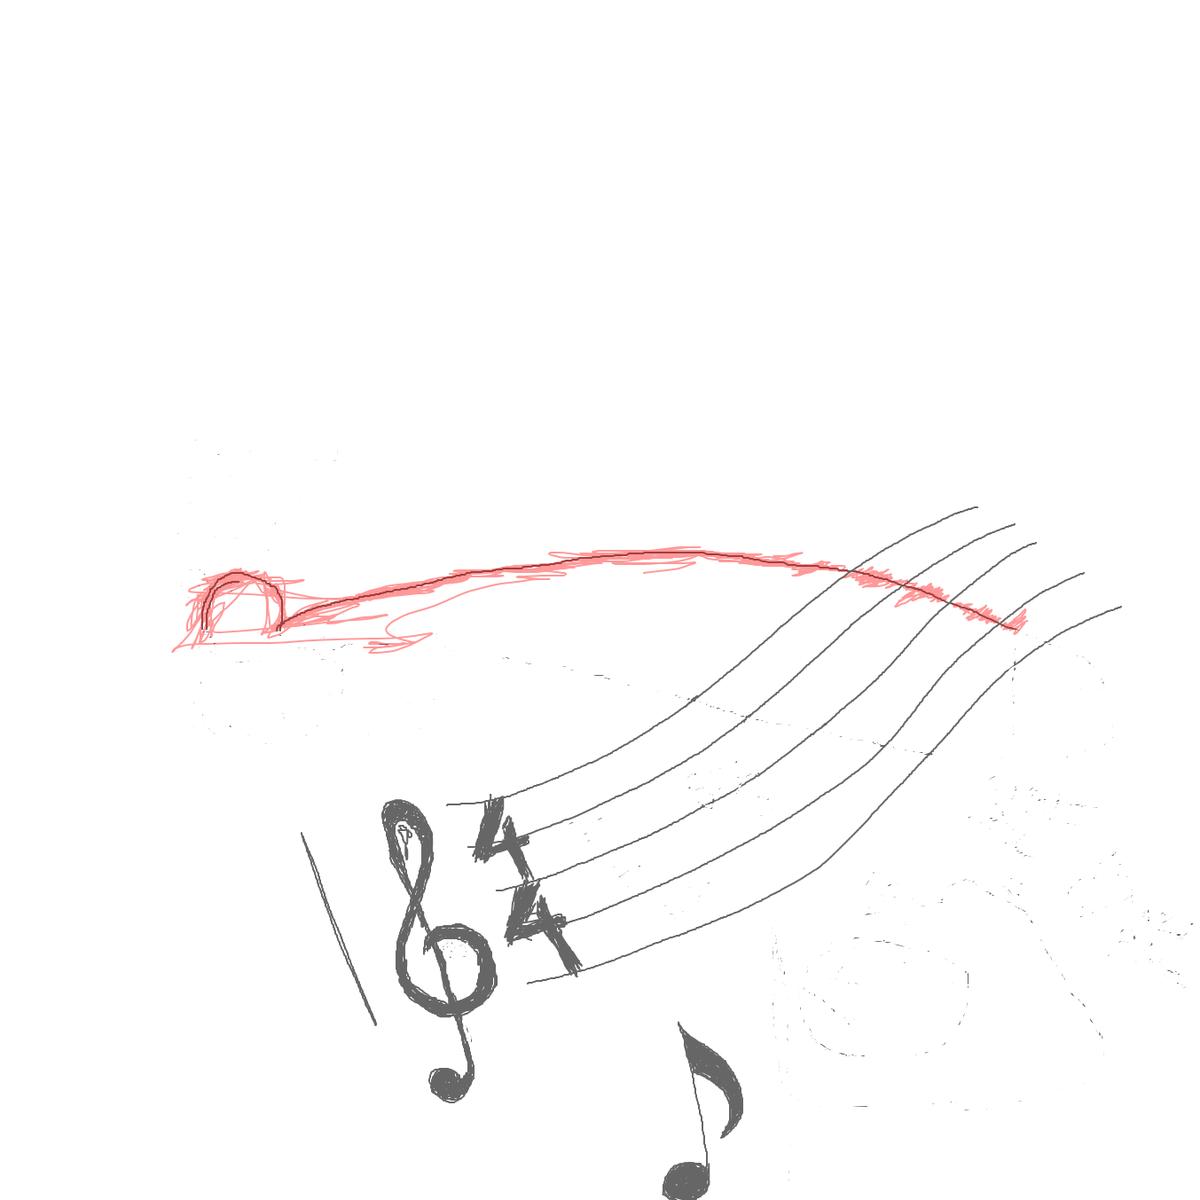 BAAAM drawing#13867 lat:39.7172241210937500lng: -75.6447448730468800